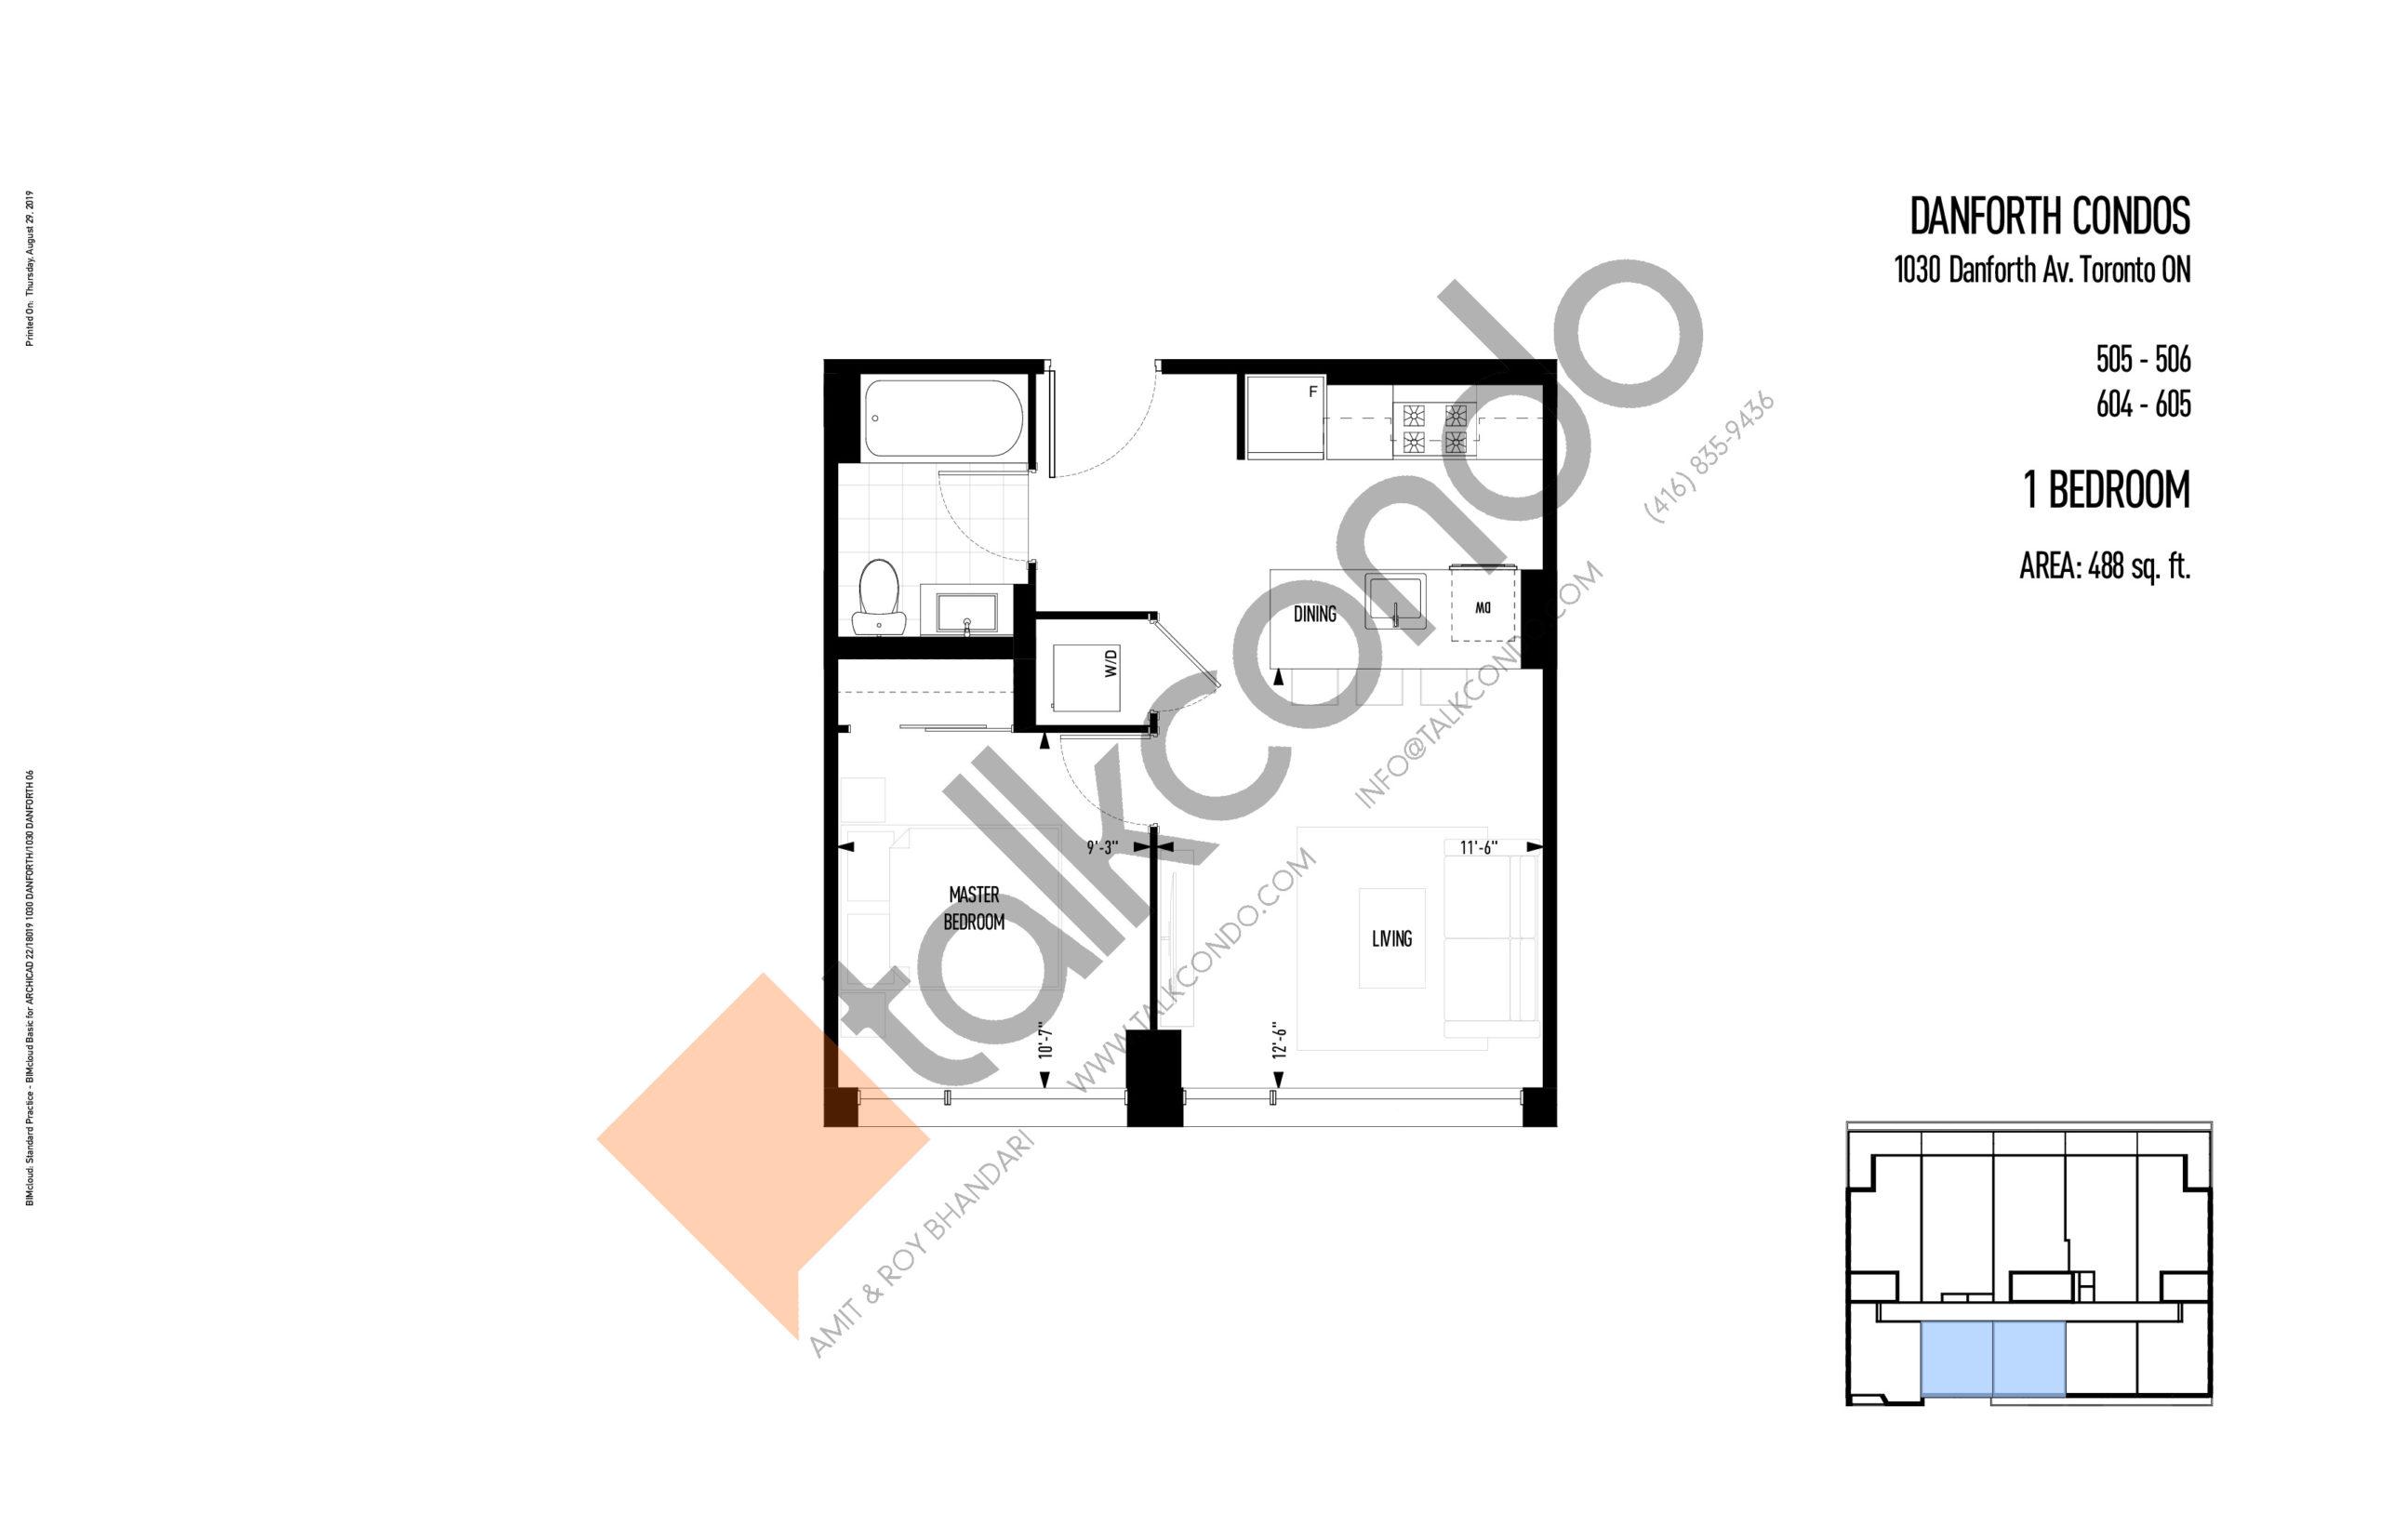 505 - 506 | 604 - 605 Floor Plan at THEO Condos - 488 sq.ft